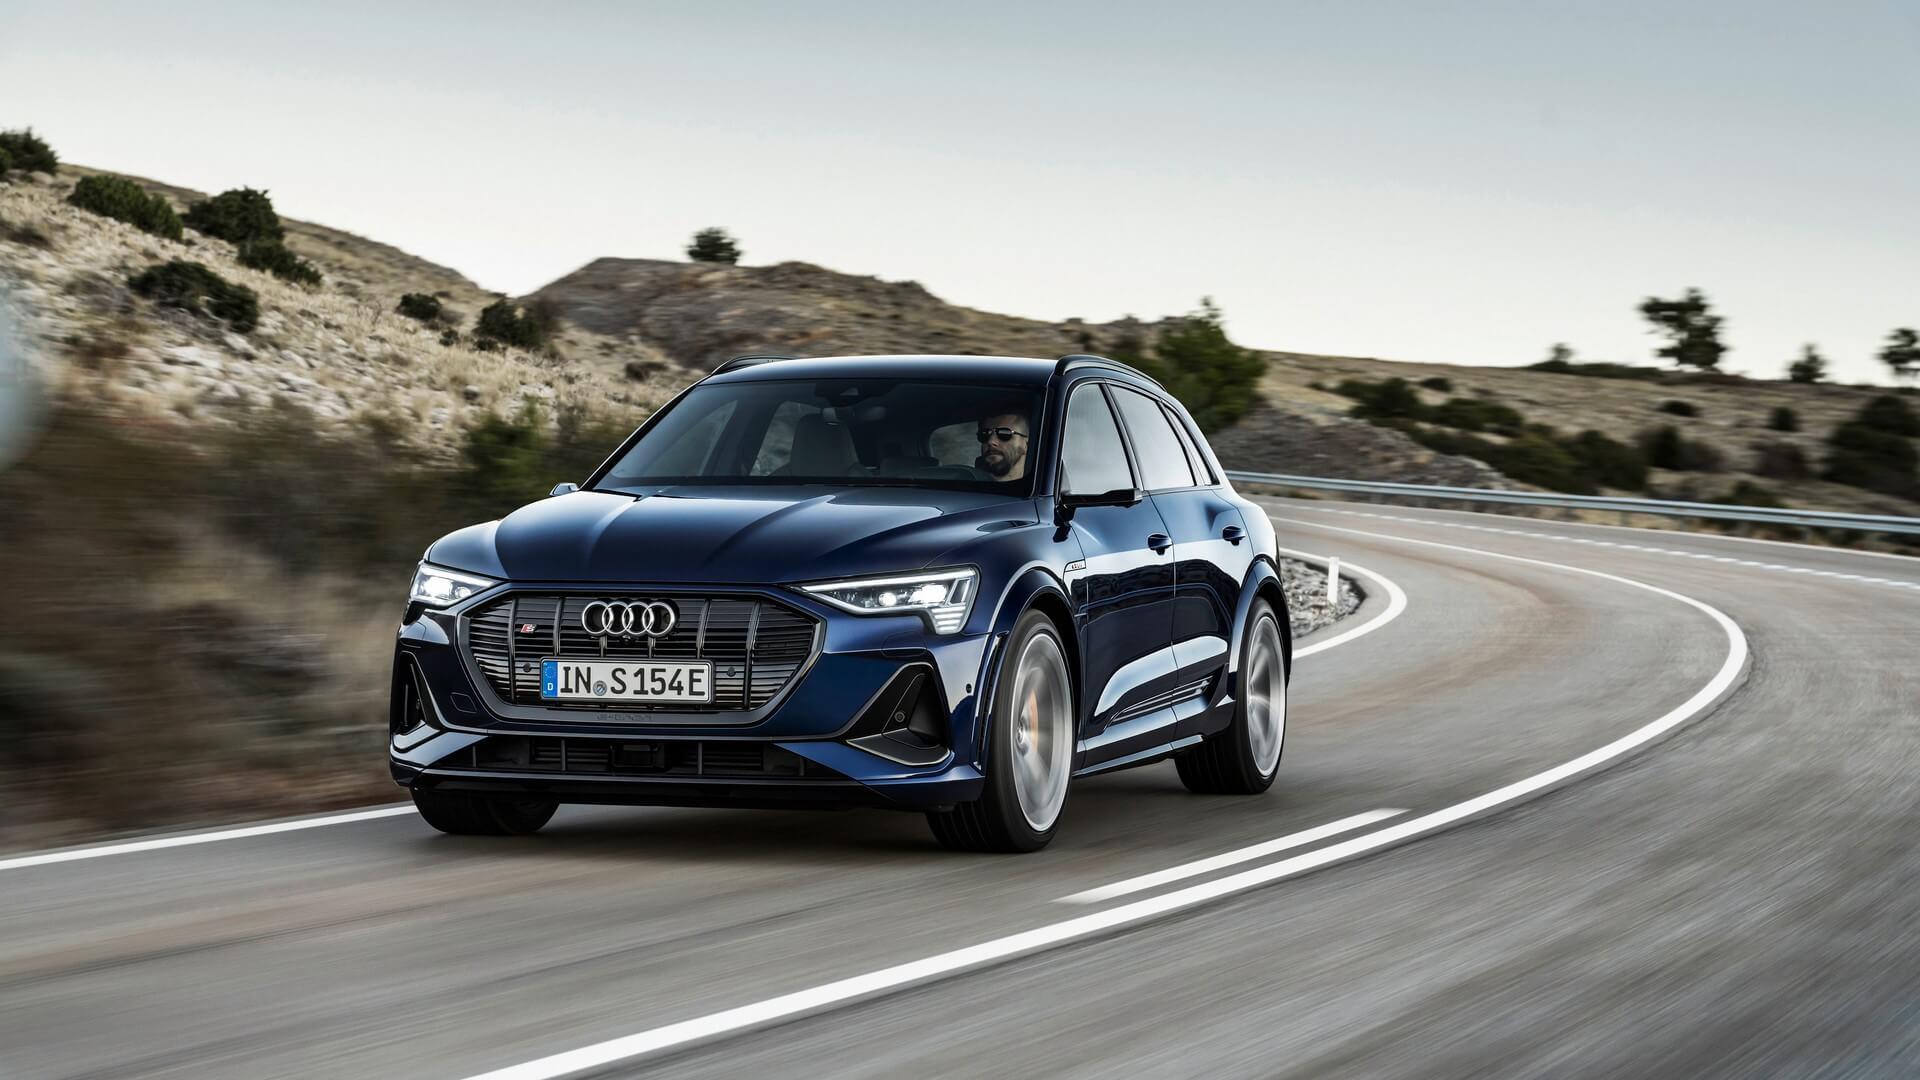 Audi-E-Tron-S-and-E-Tron-S-Sportback-2020-4